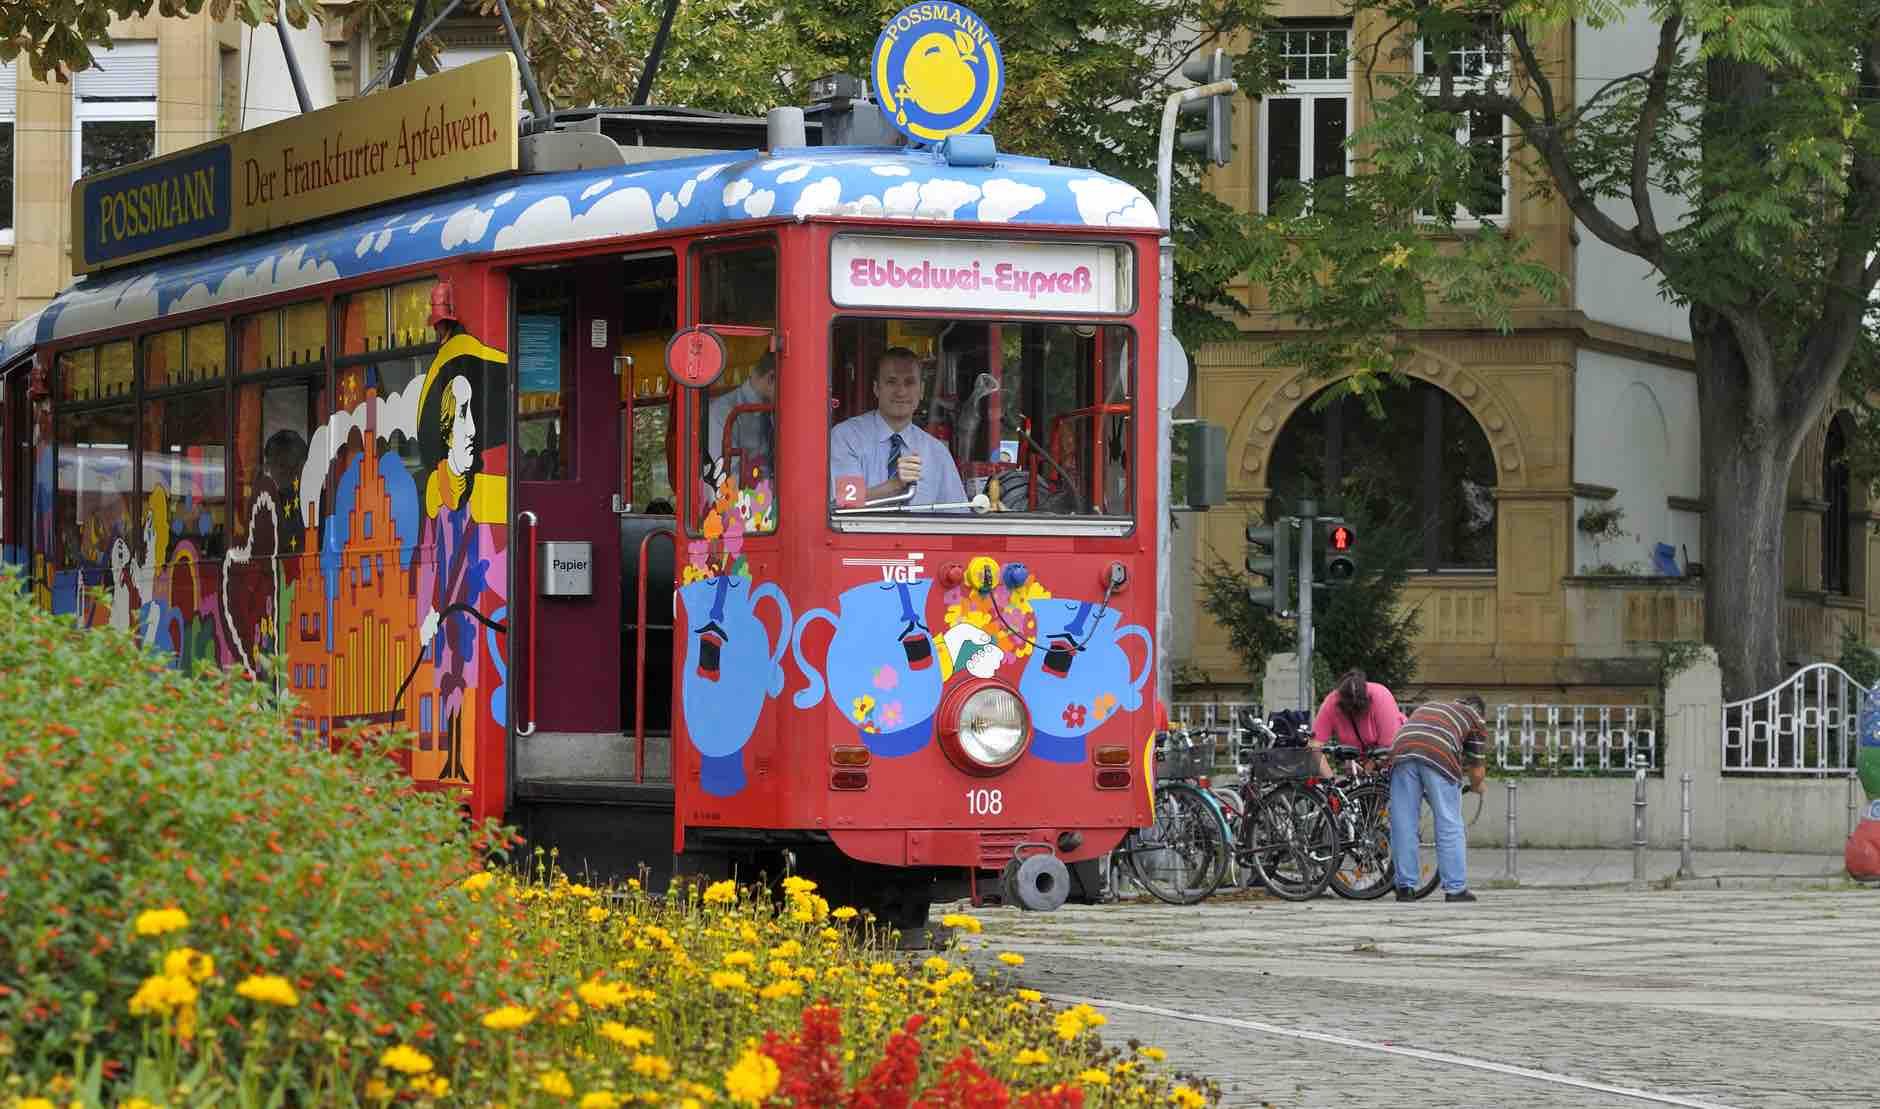 Ebbelwei-Expreß train with alpfelwien